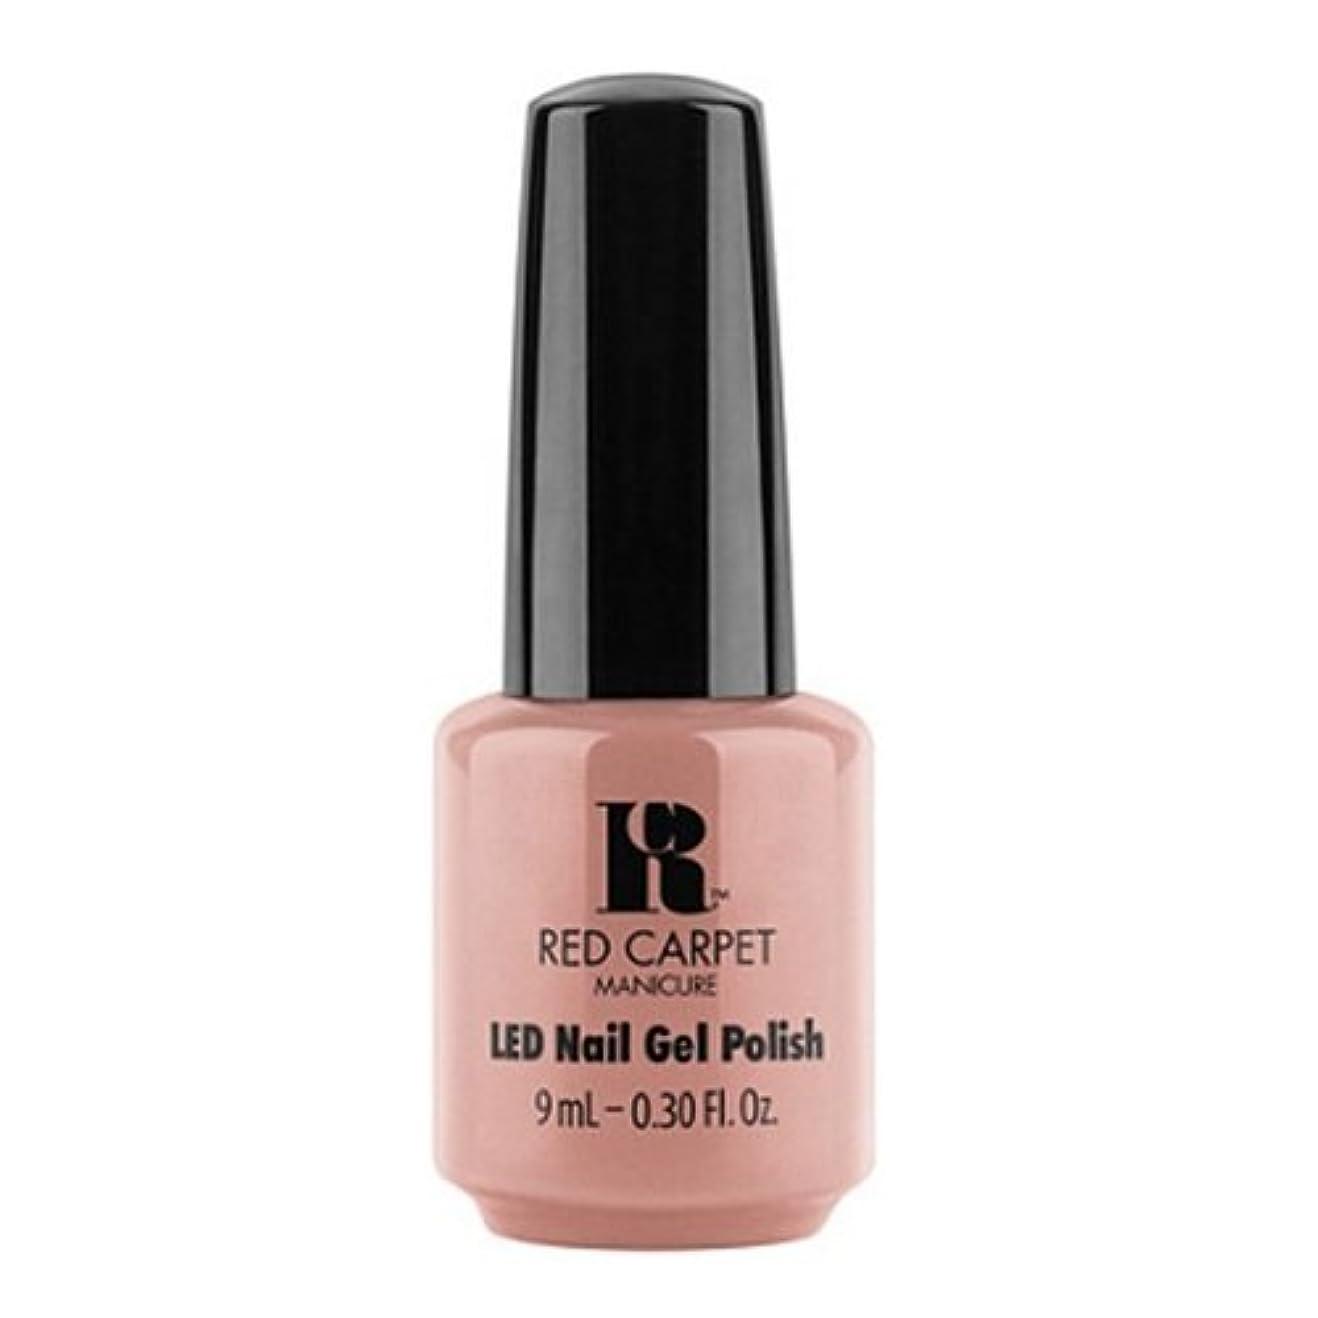 Red Carpet Manicure - LED Nail Gel Polish - #manigoals - 0.3oz / 9ml